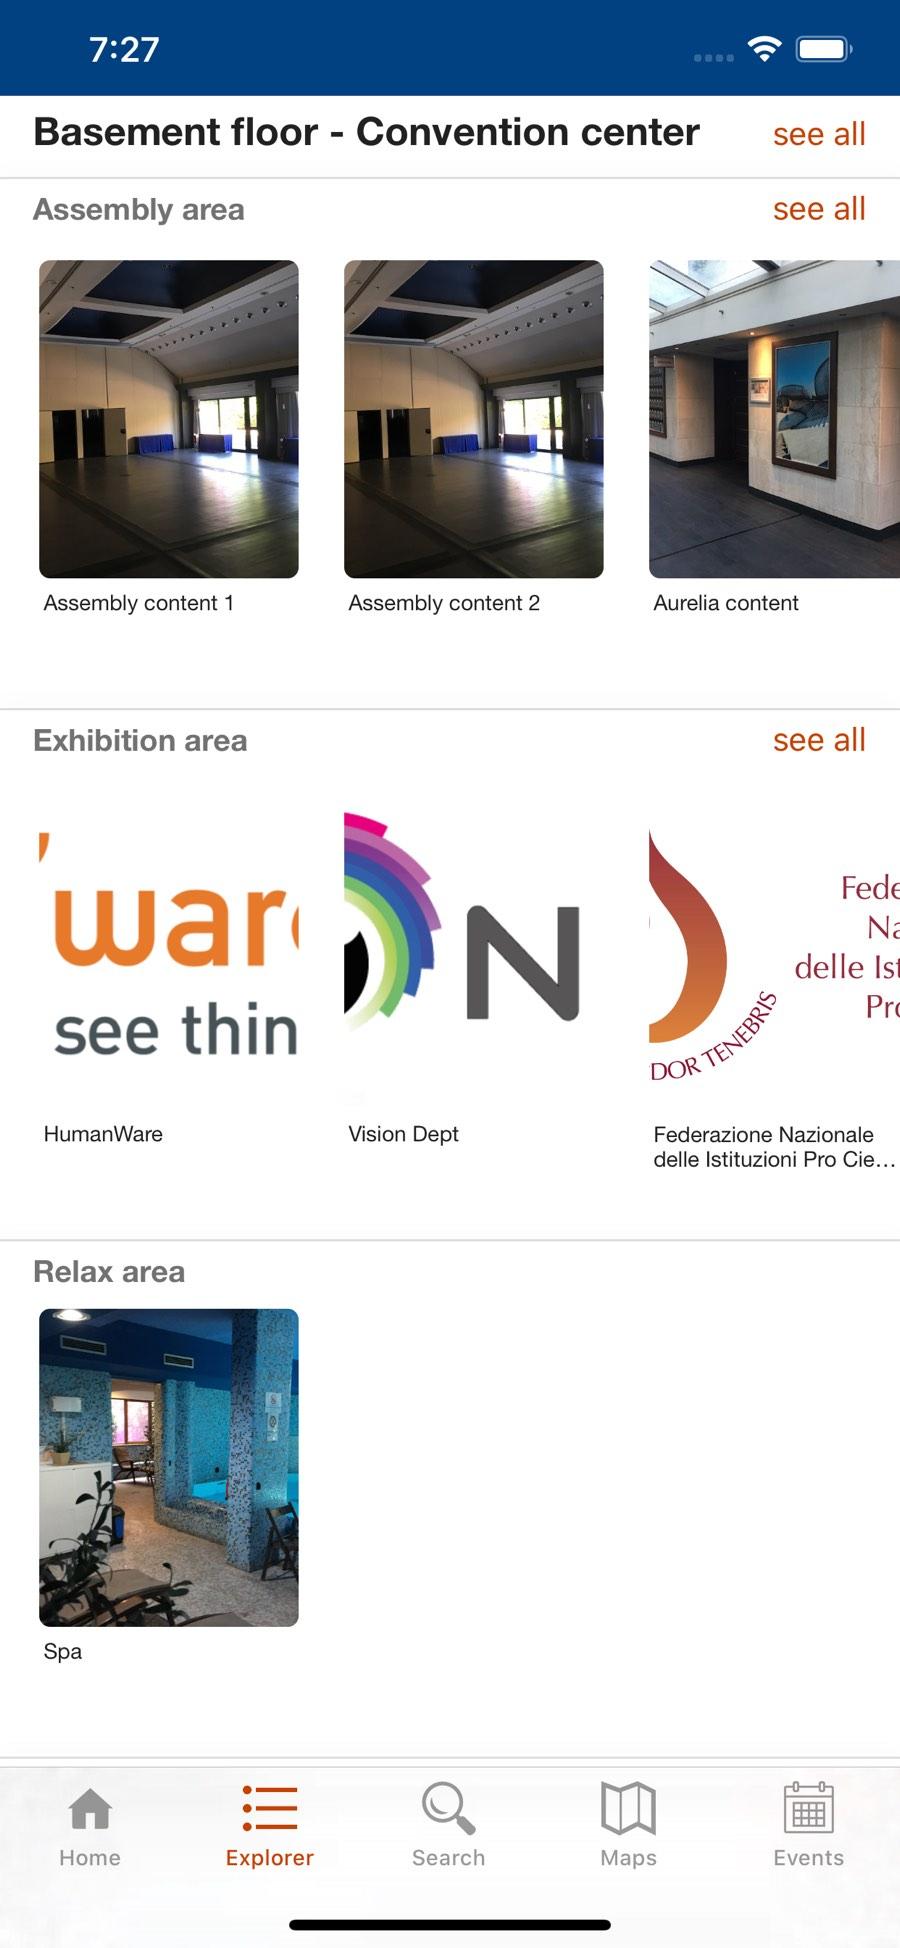 Schermata explorer dell'app EBU